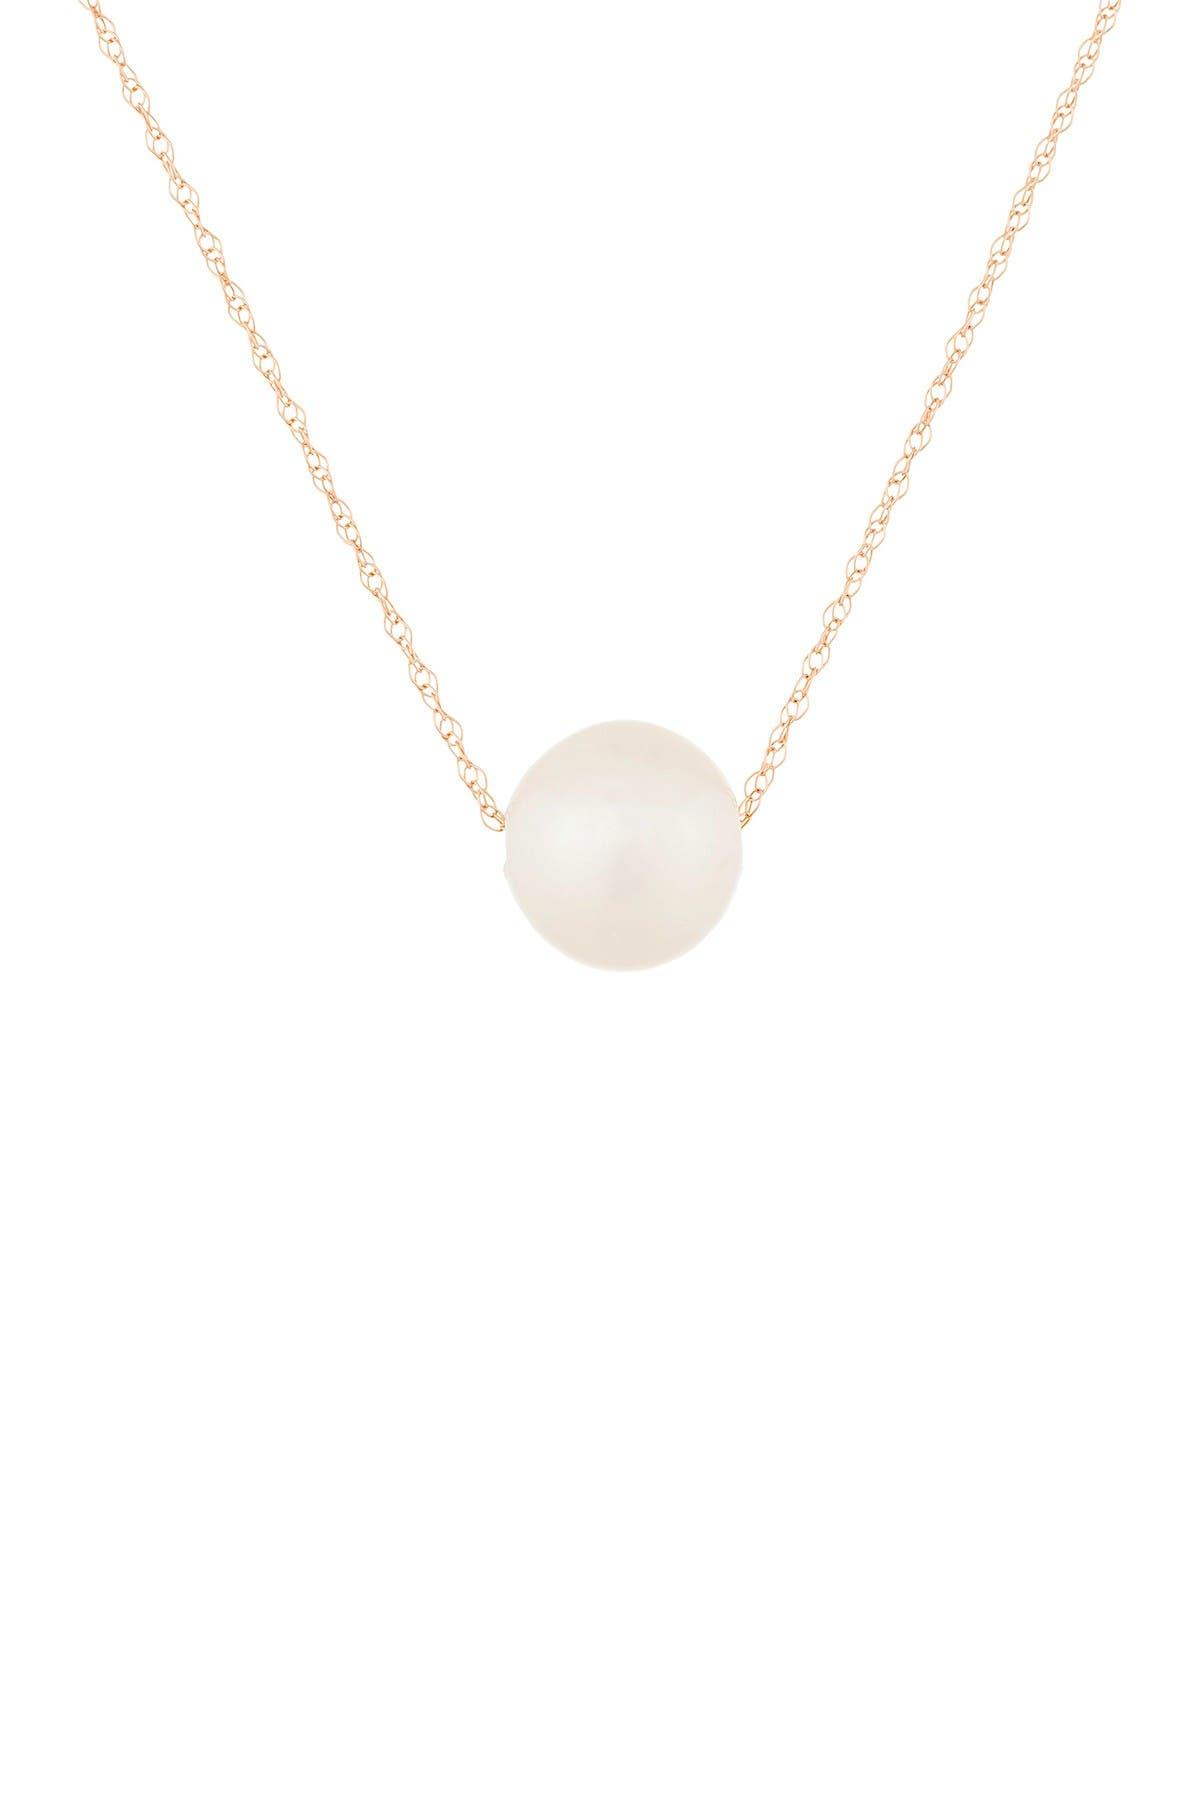 Image of Splendid Pearls 14K Rose Gold 10-11mm Freshwater Pearl Pendant Necklace